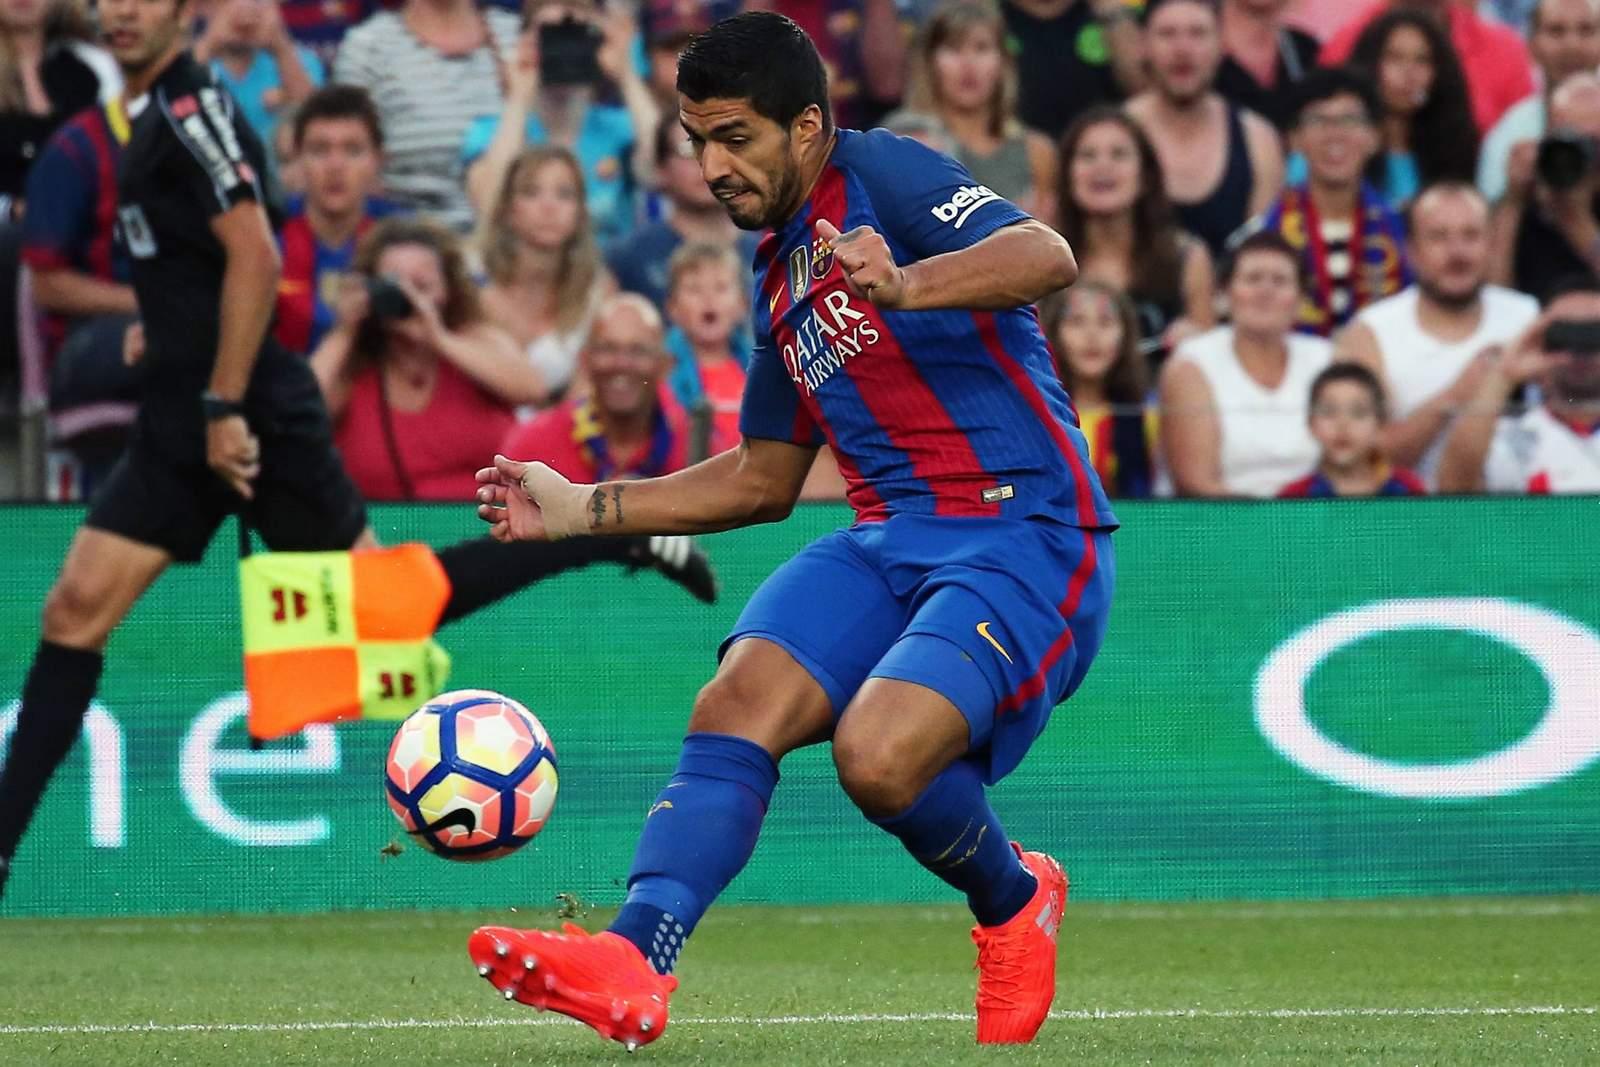 Luis Suarez zieht ab. Jetzt auf Villarreal gegen FC Barcelona wetten!